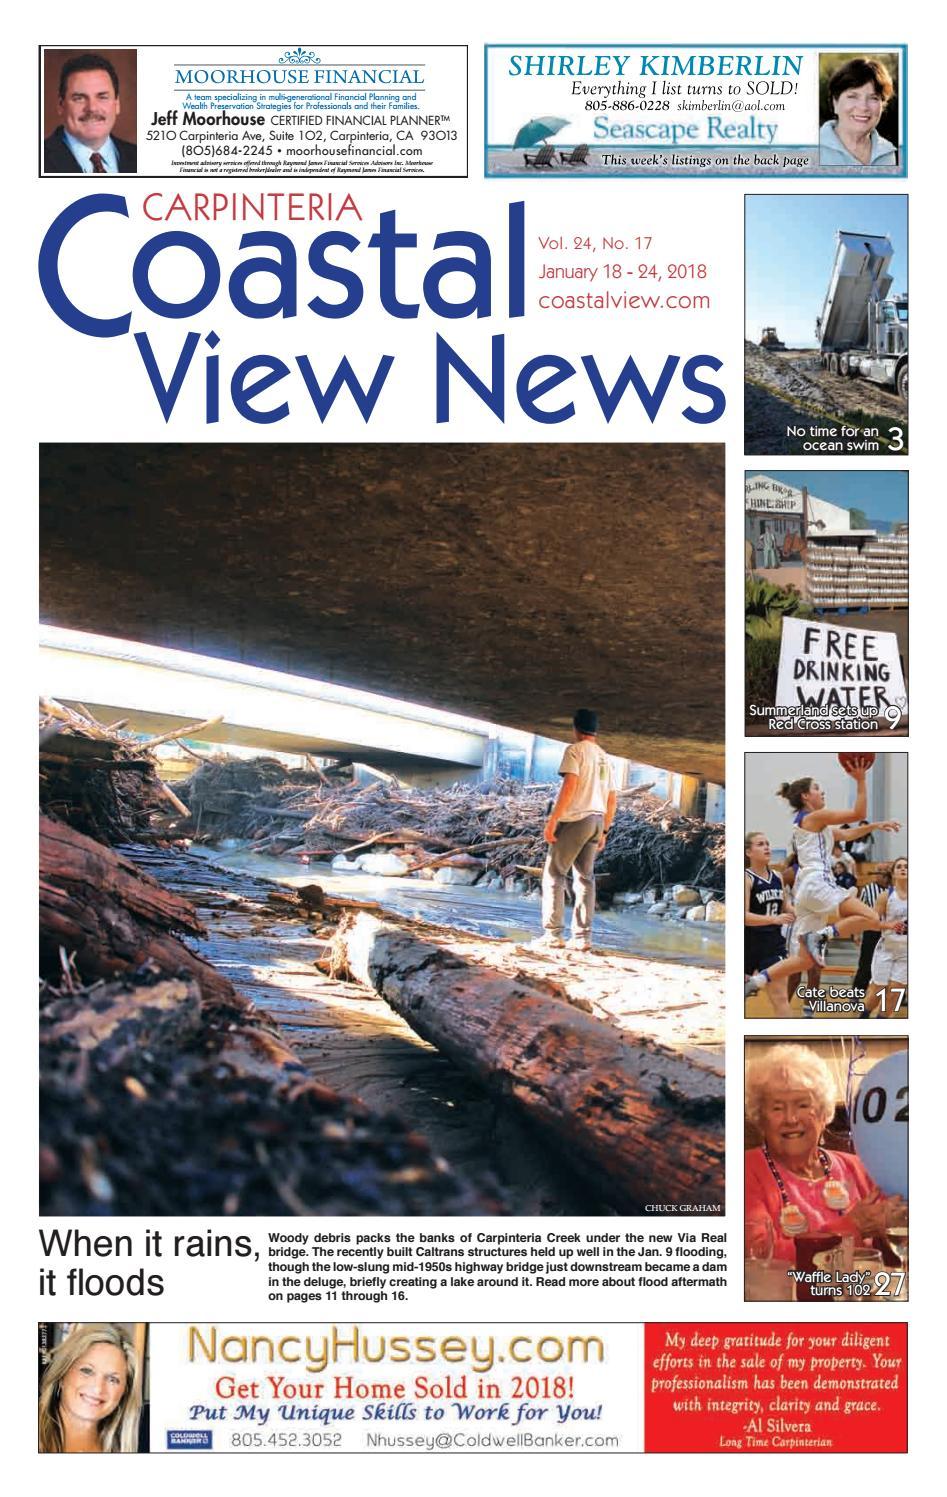 Coastal view news january 18 2018 by coastal view news issuu fandeluxe Gallery